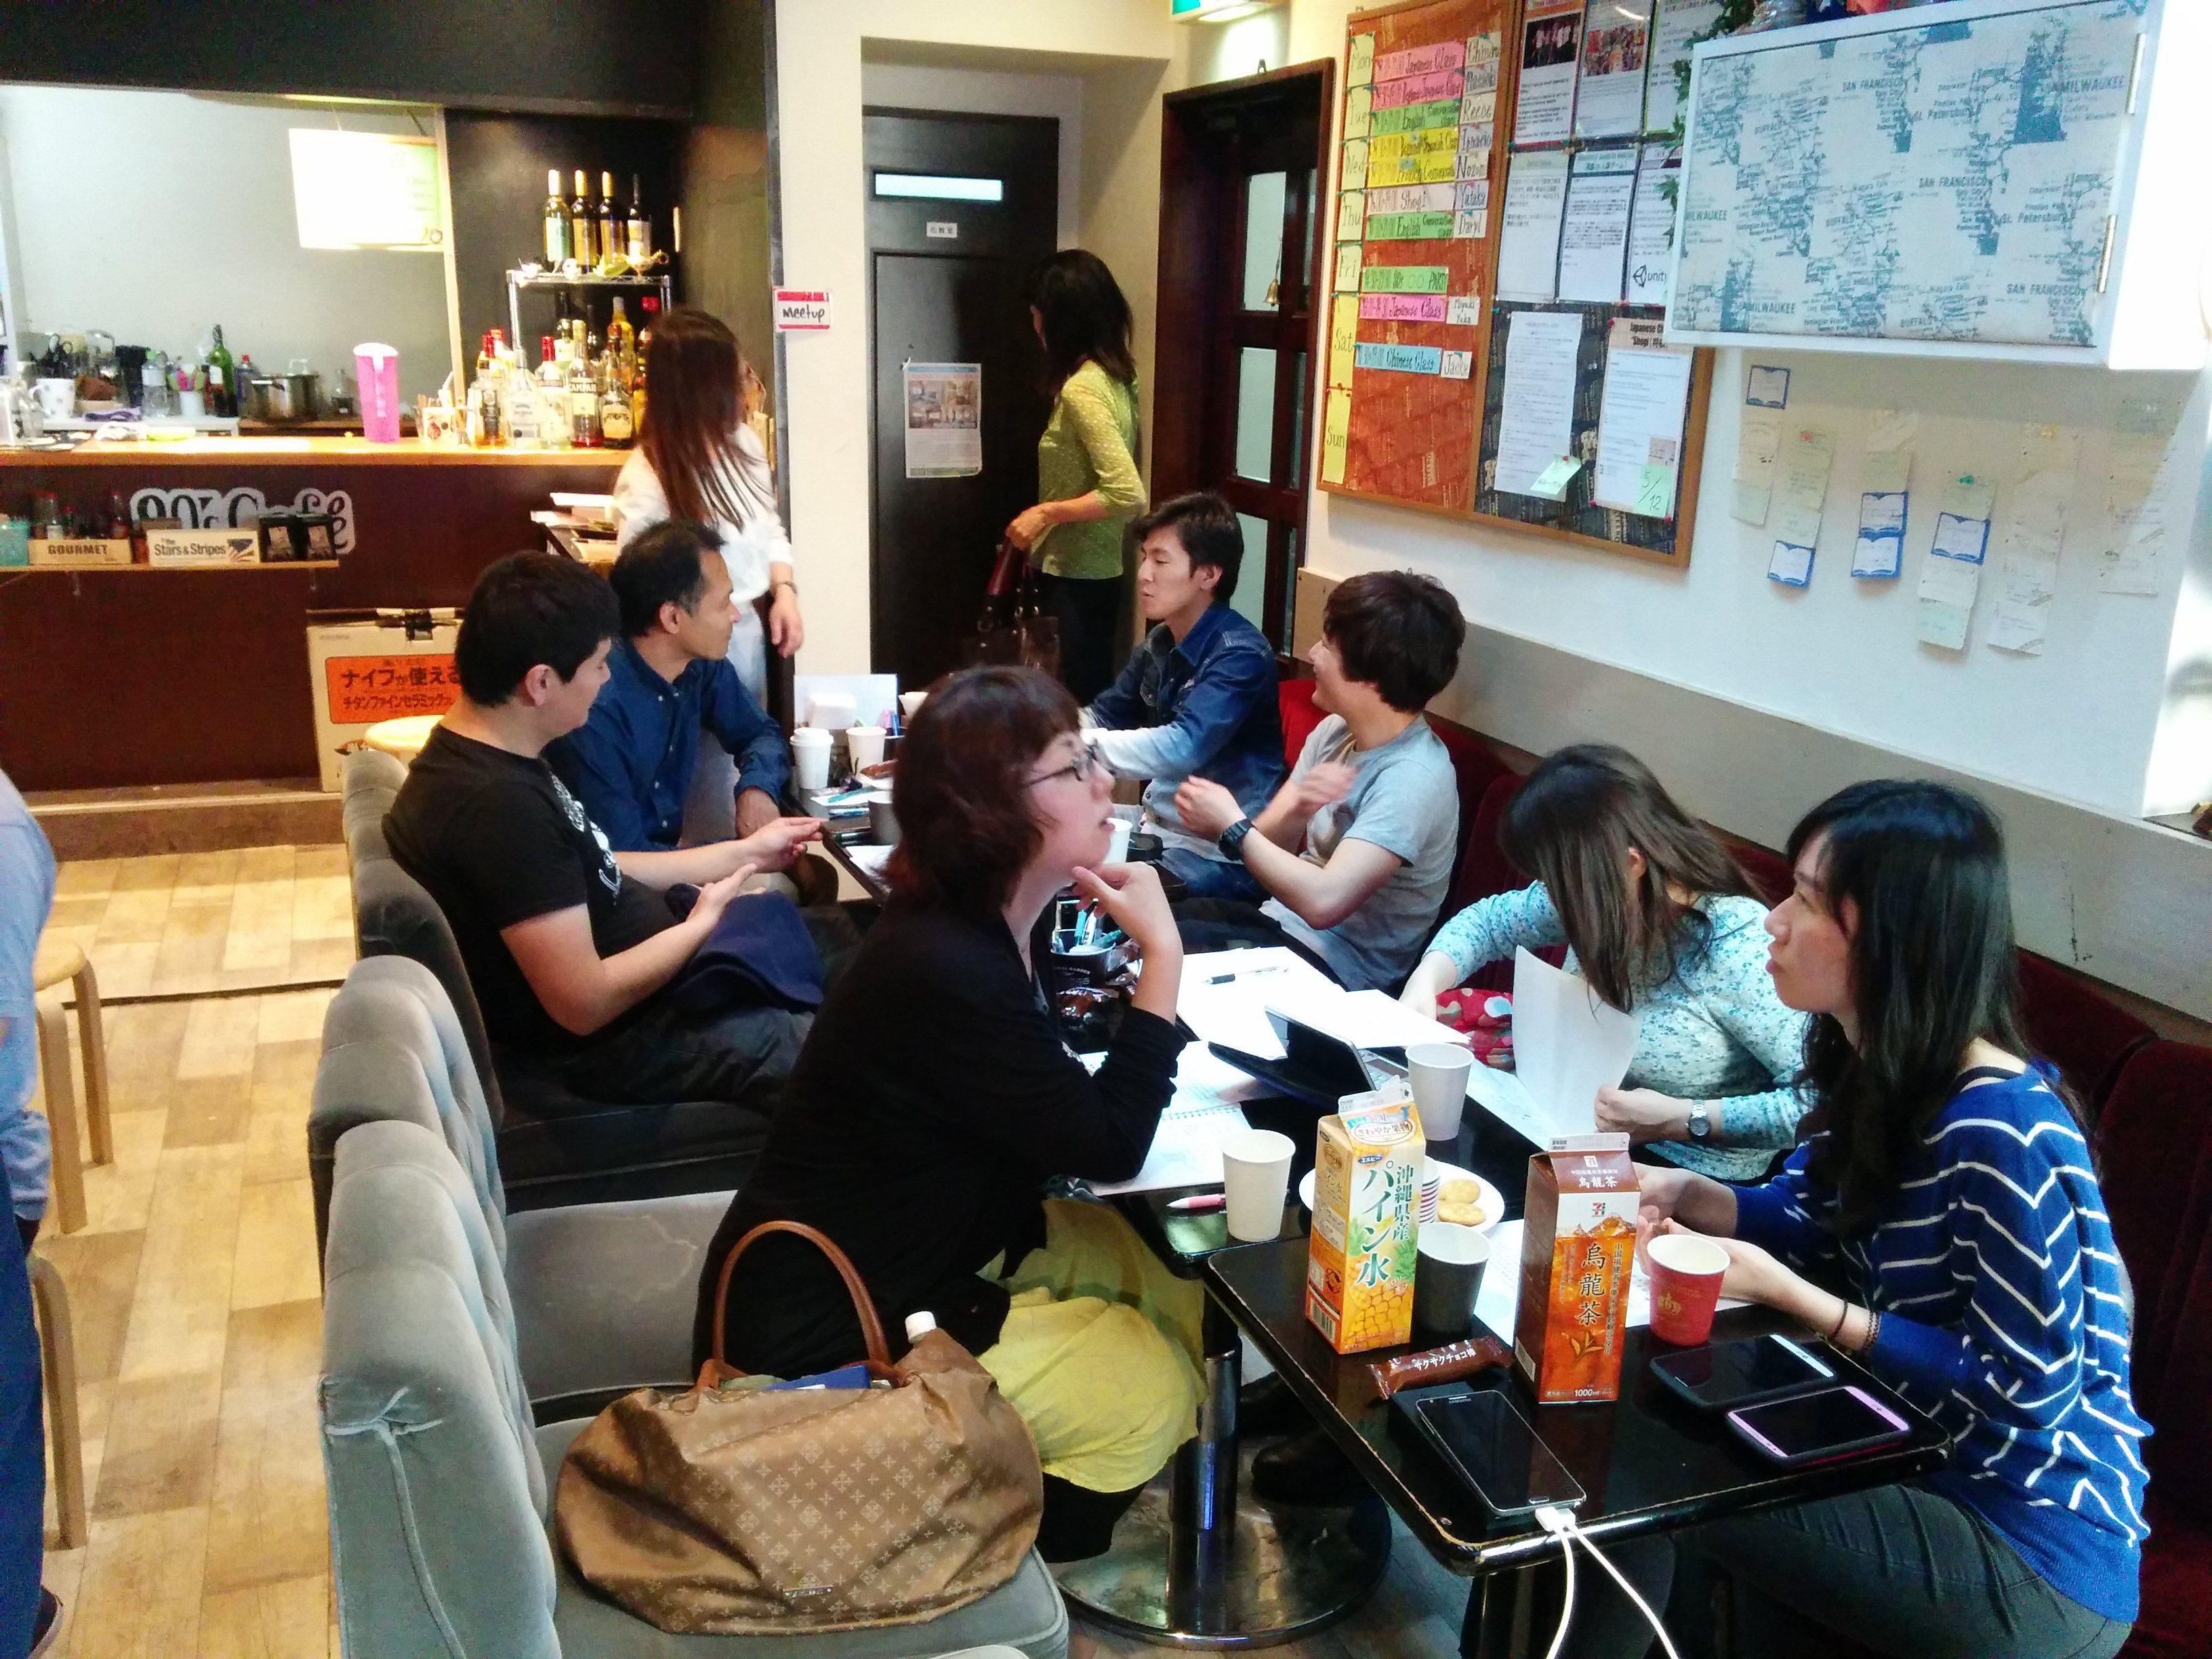 Chinese中国語/Korean韓国語 study group @ 80's Cafe